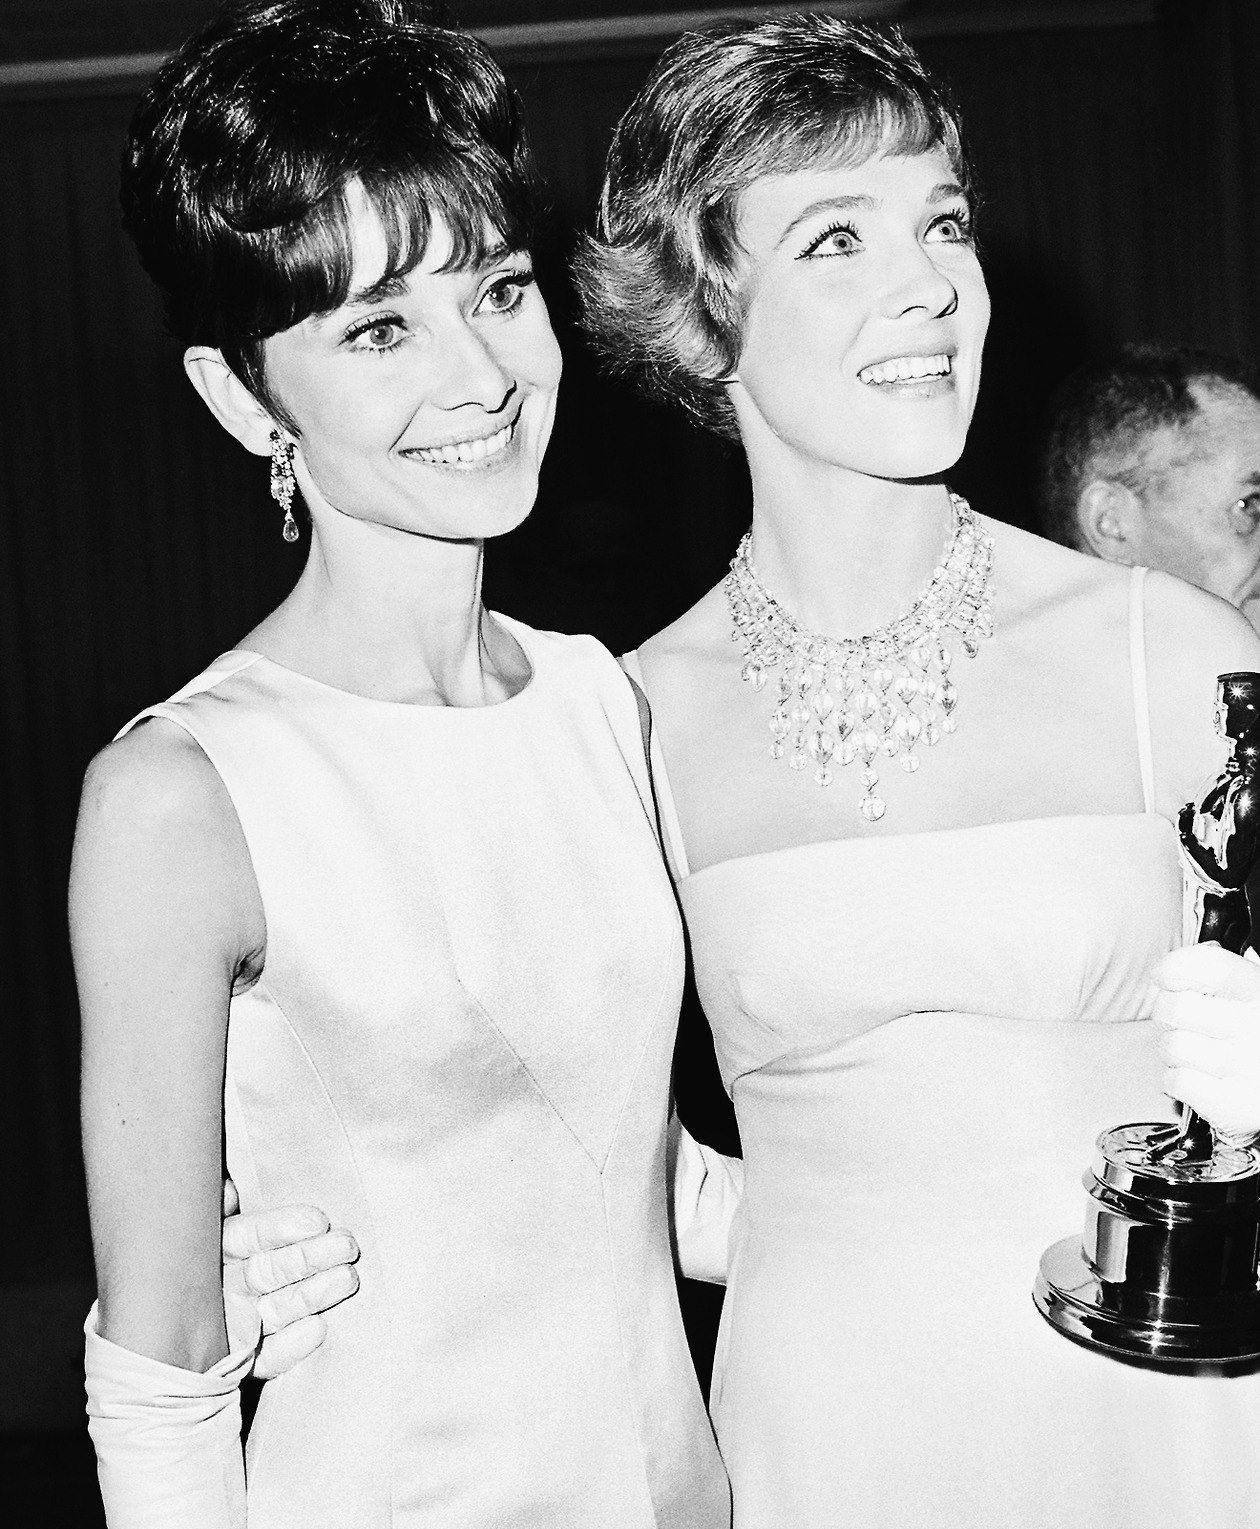 Julie and Audrey